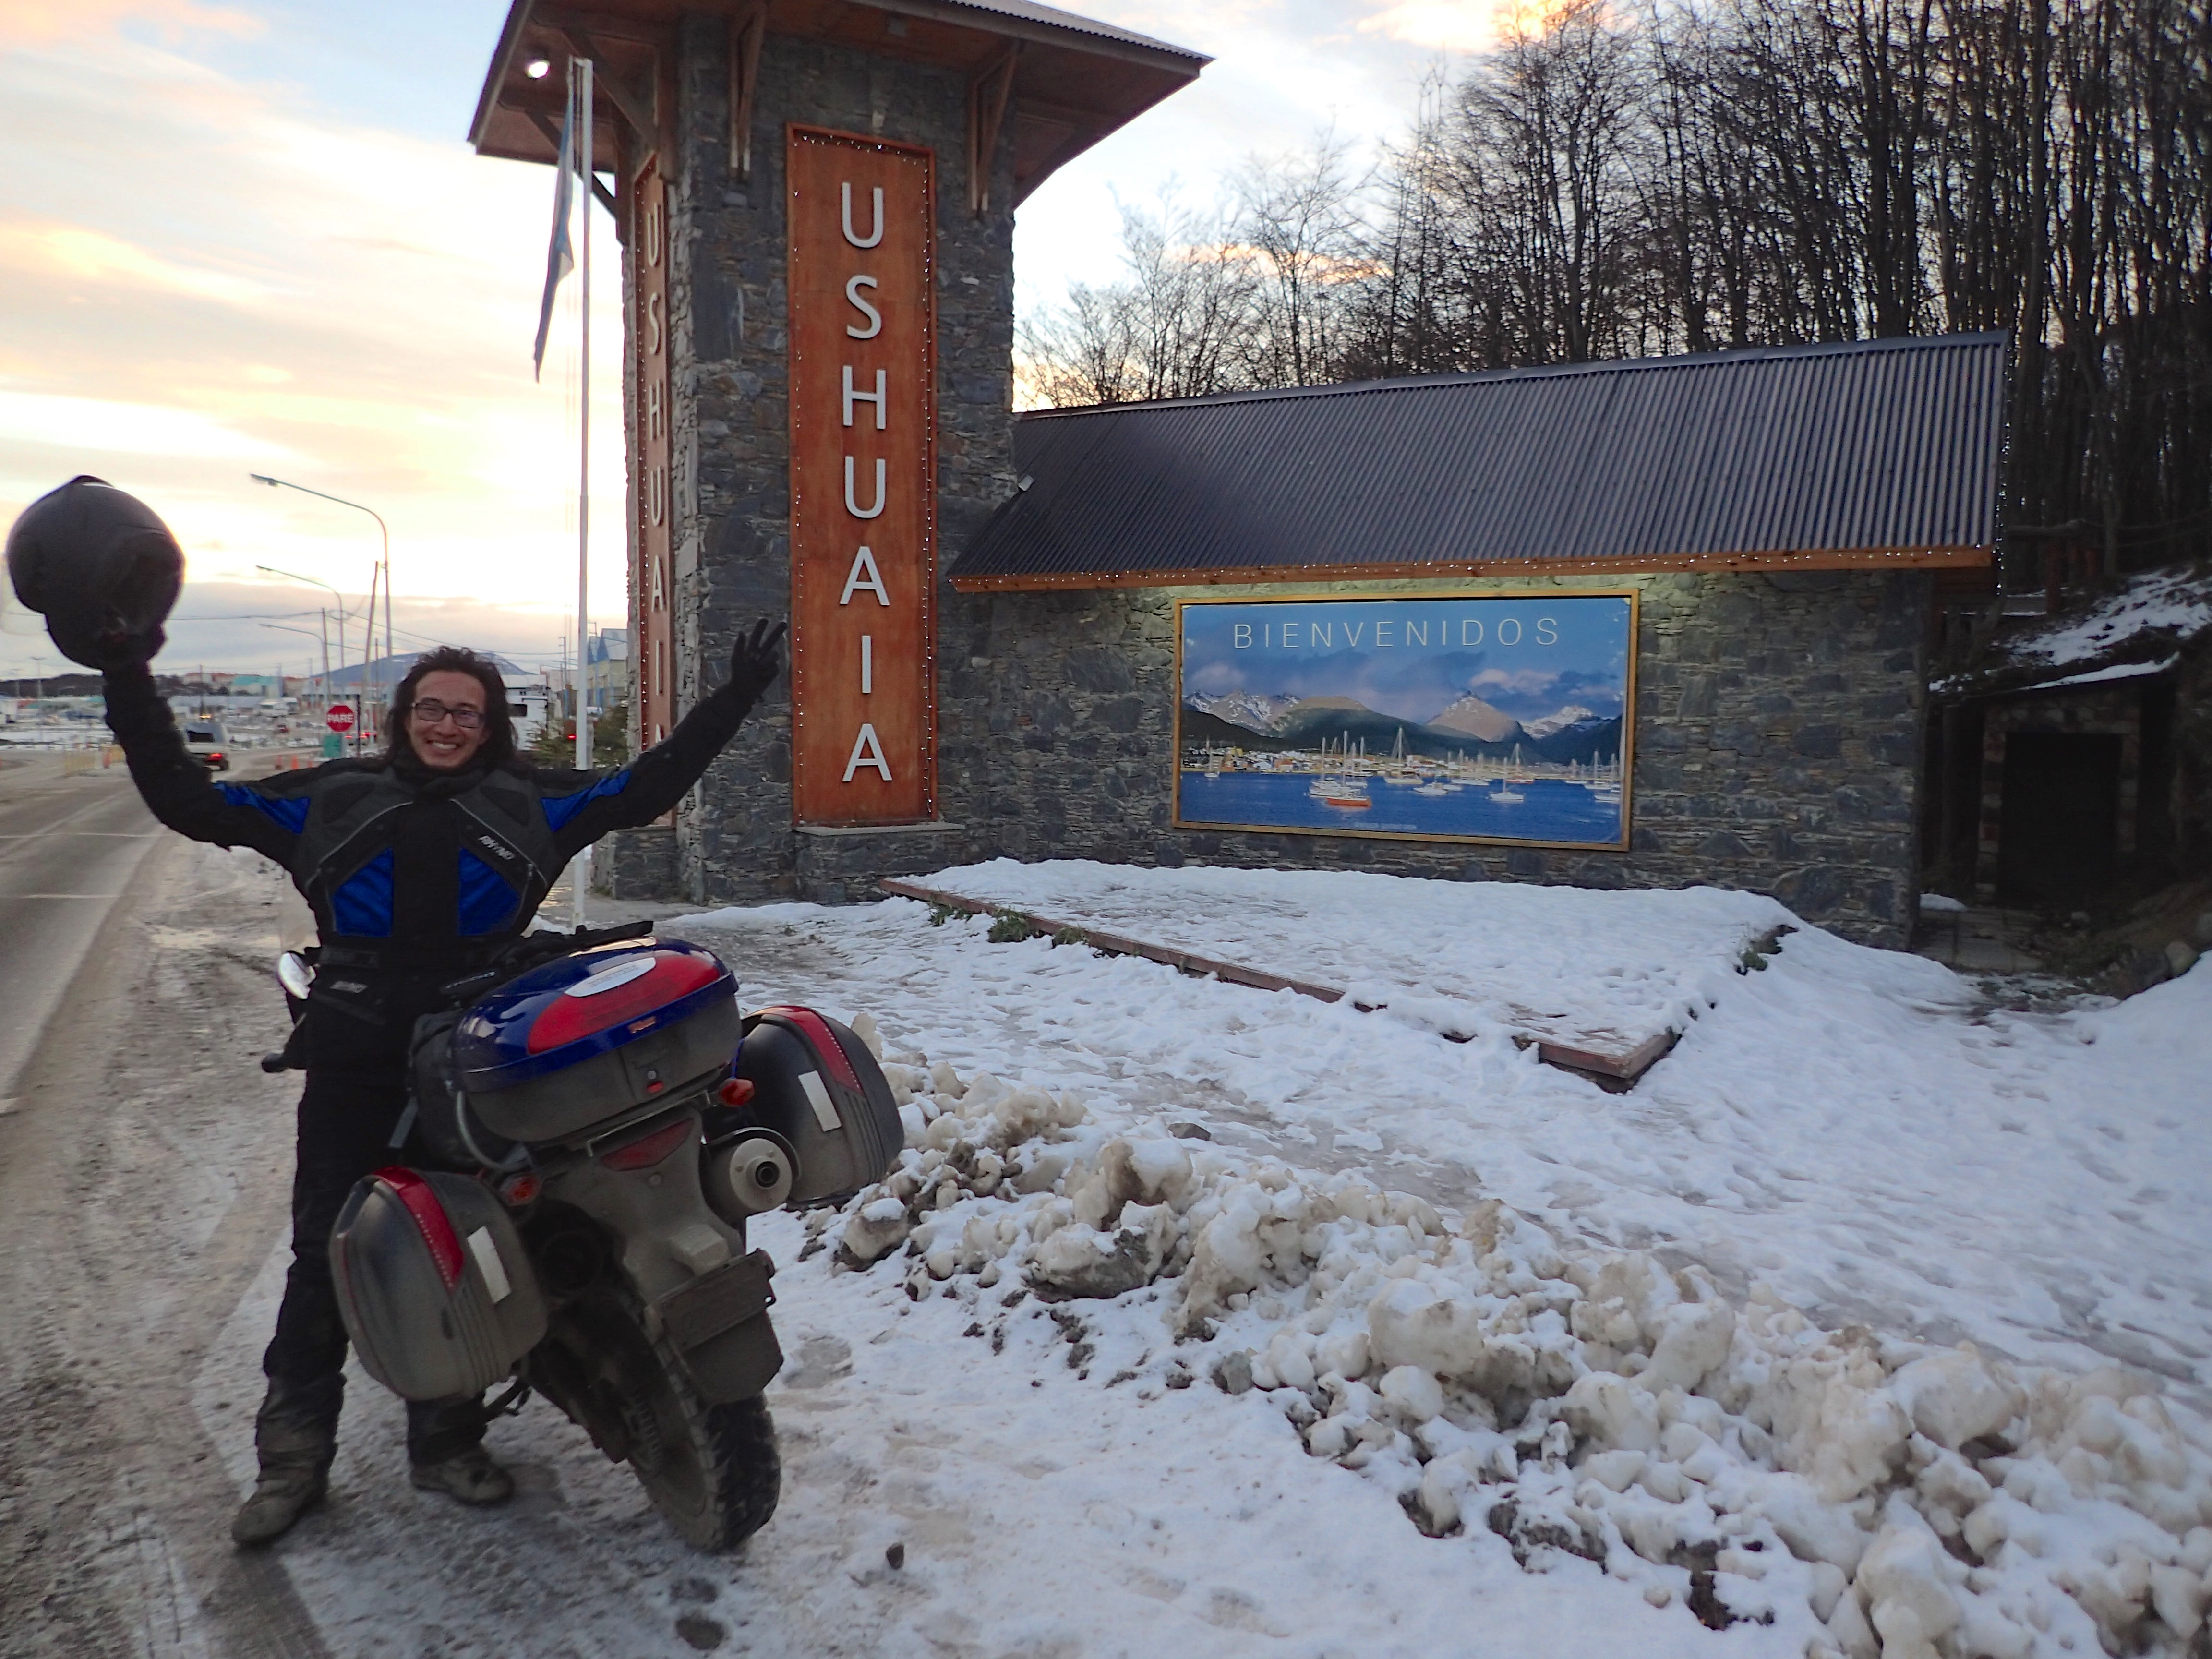 Arrival in Ushuaia!